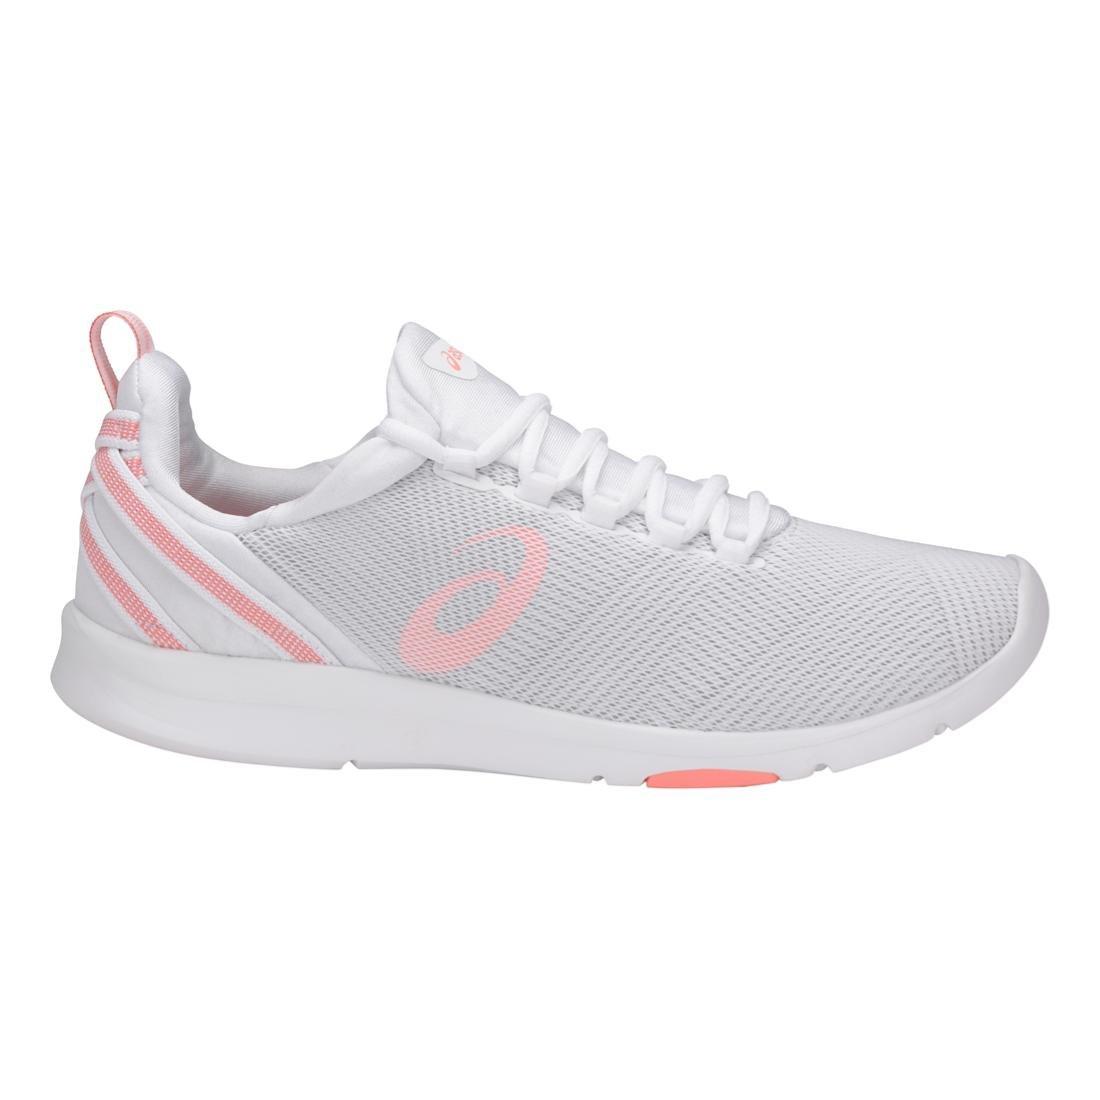 ASICS Women's Gel-Fit Sana 3 Cross-Trainer Shoe B071HTF1PF 9 B(M) US|White/Begonia Pink/Glacier Grey